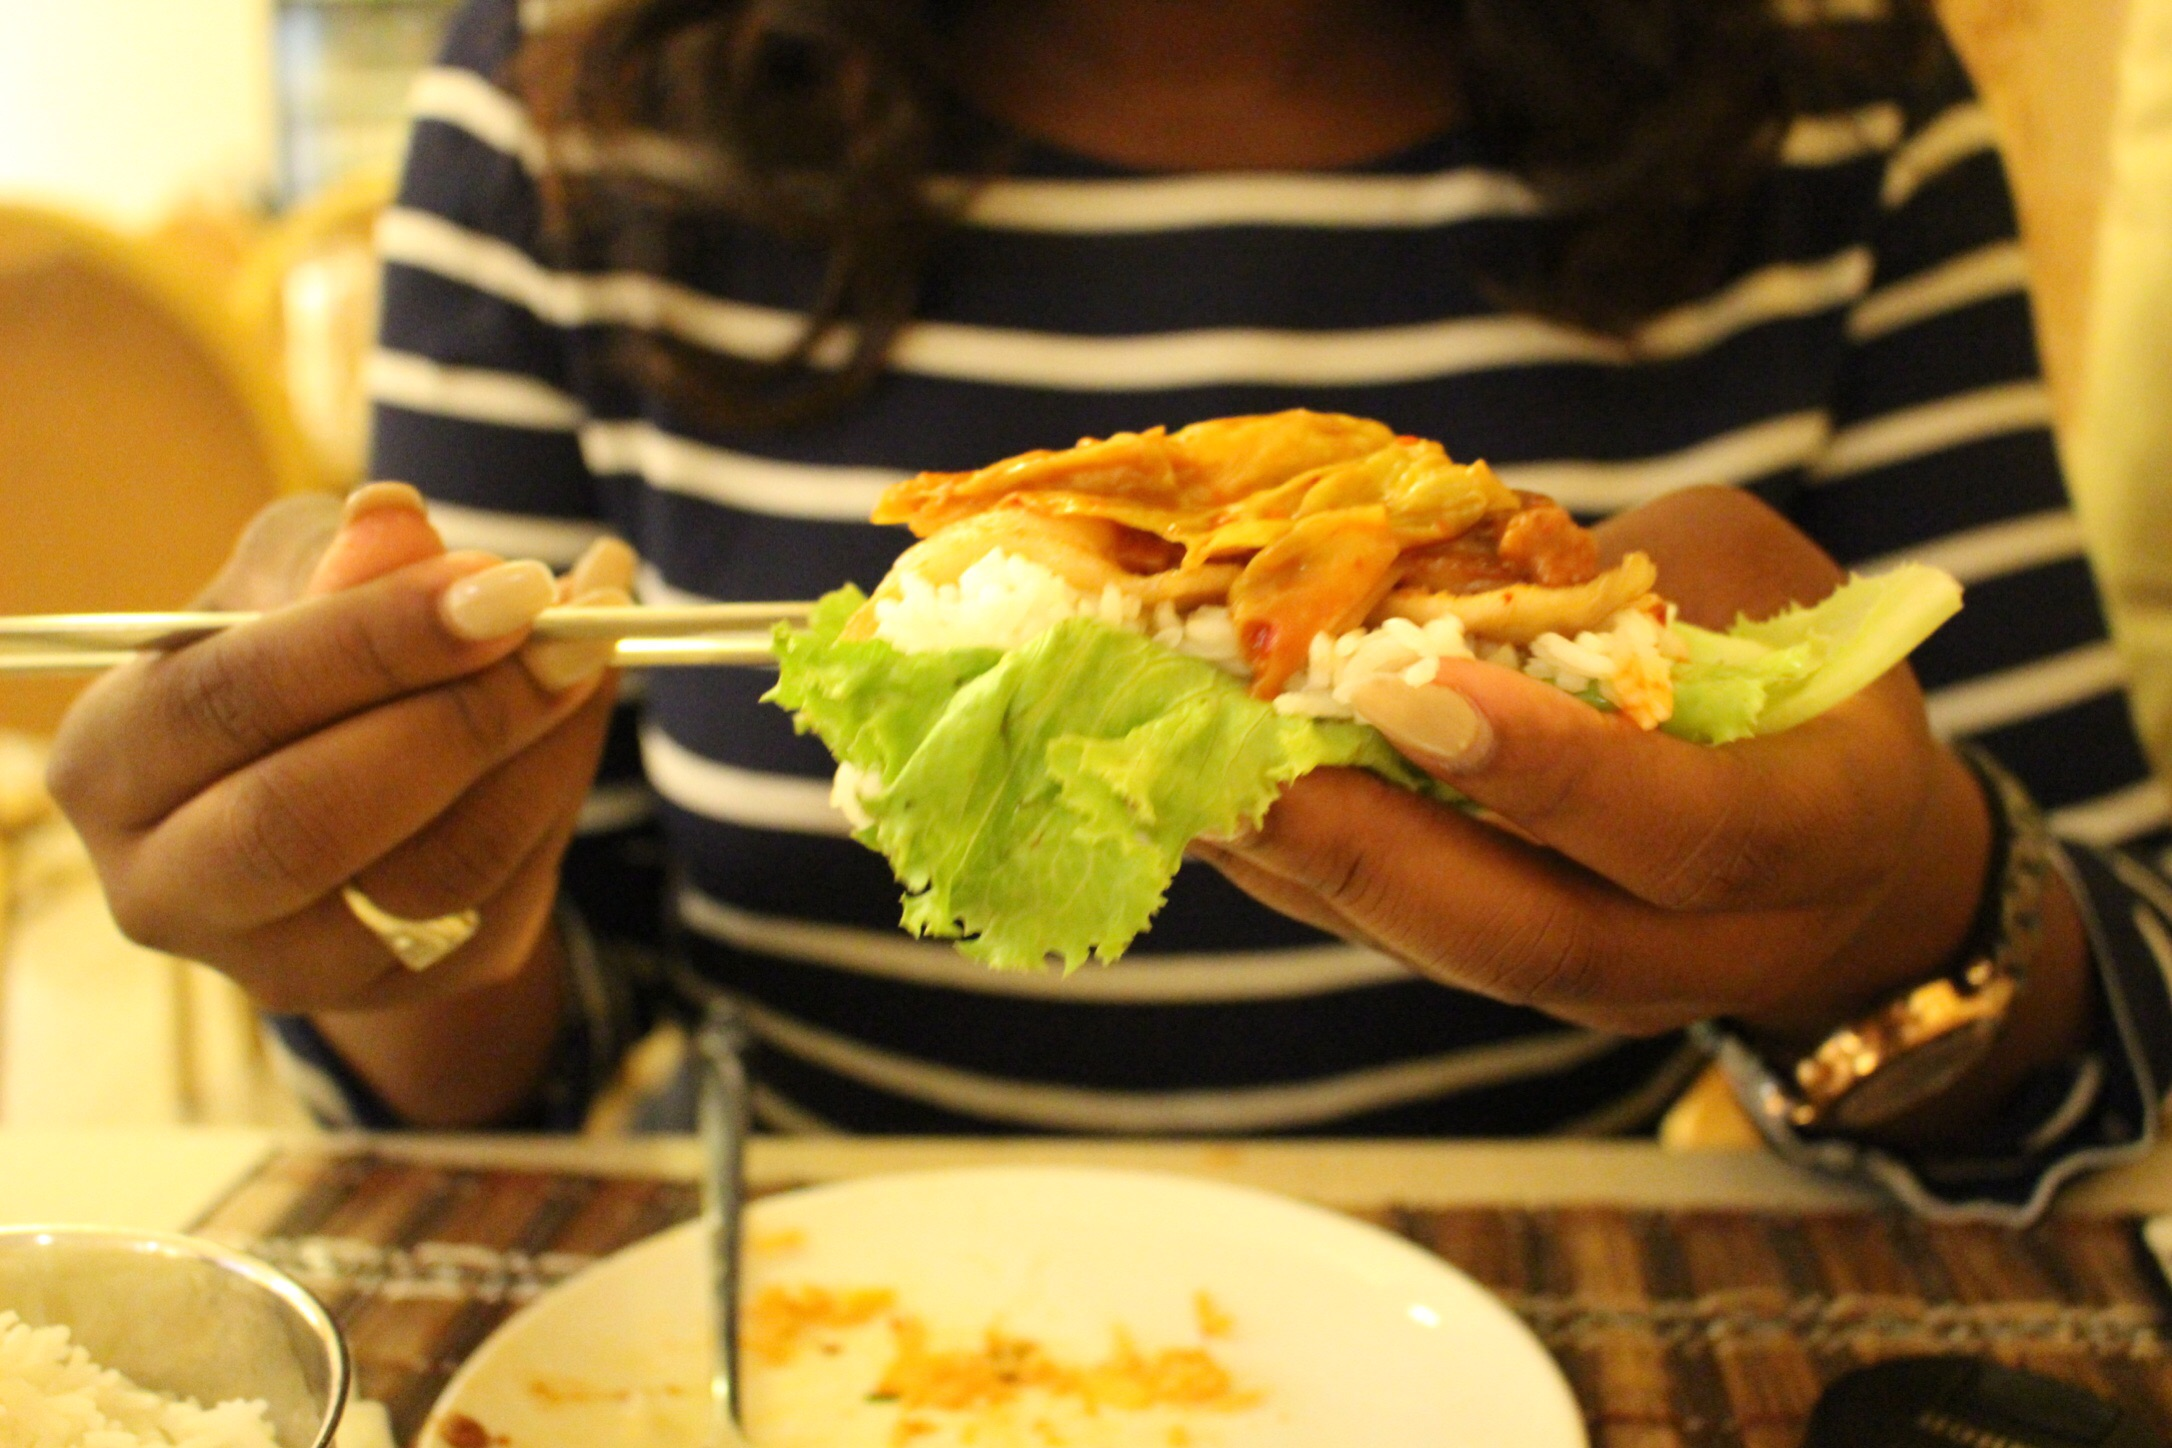 Ash's lettuce roll!